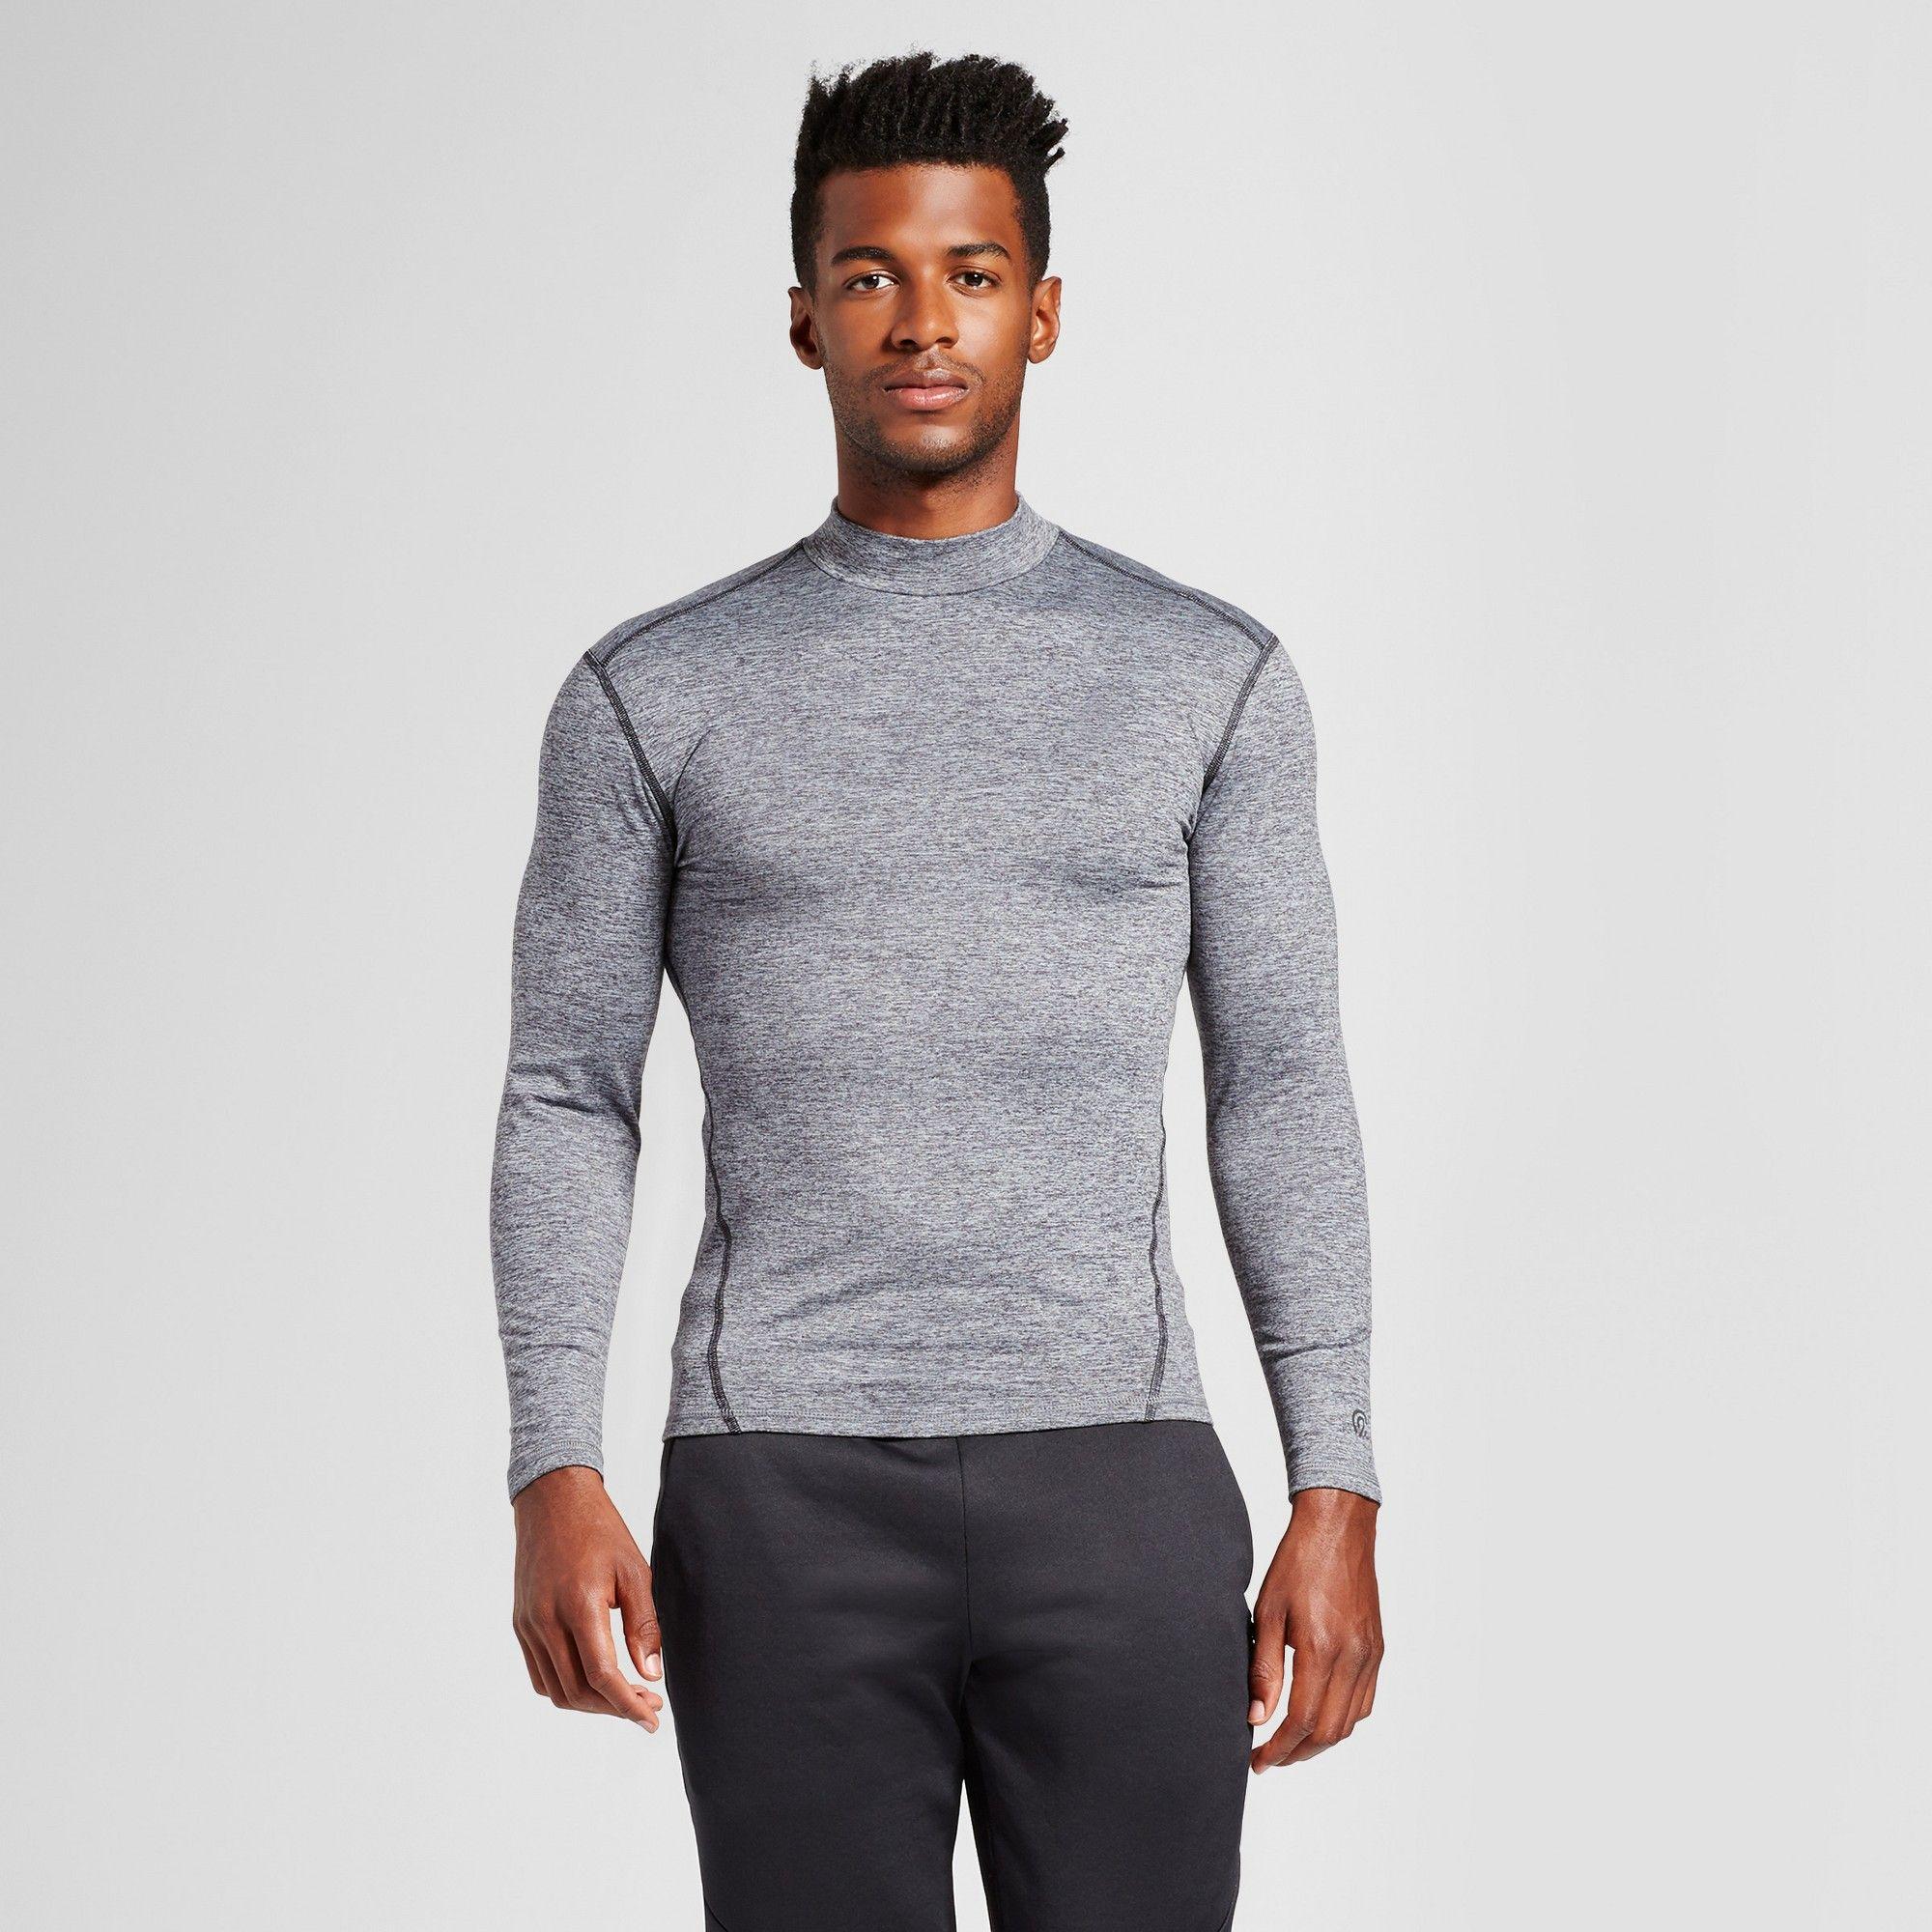 1b7ab82f0c9e Men's Long Sleeve Mock Neck Compression Shirt - C9 Champion Silver Xxl